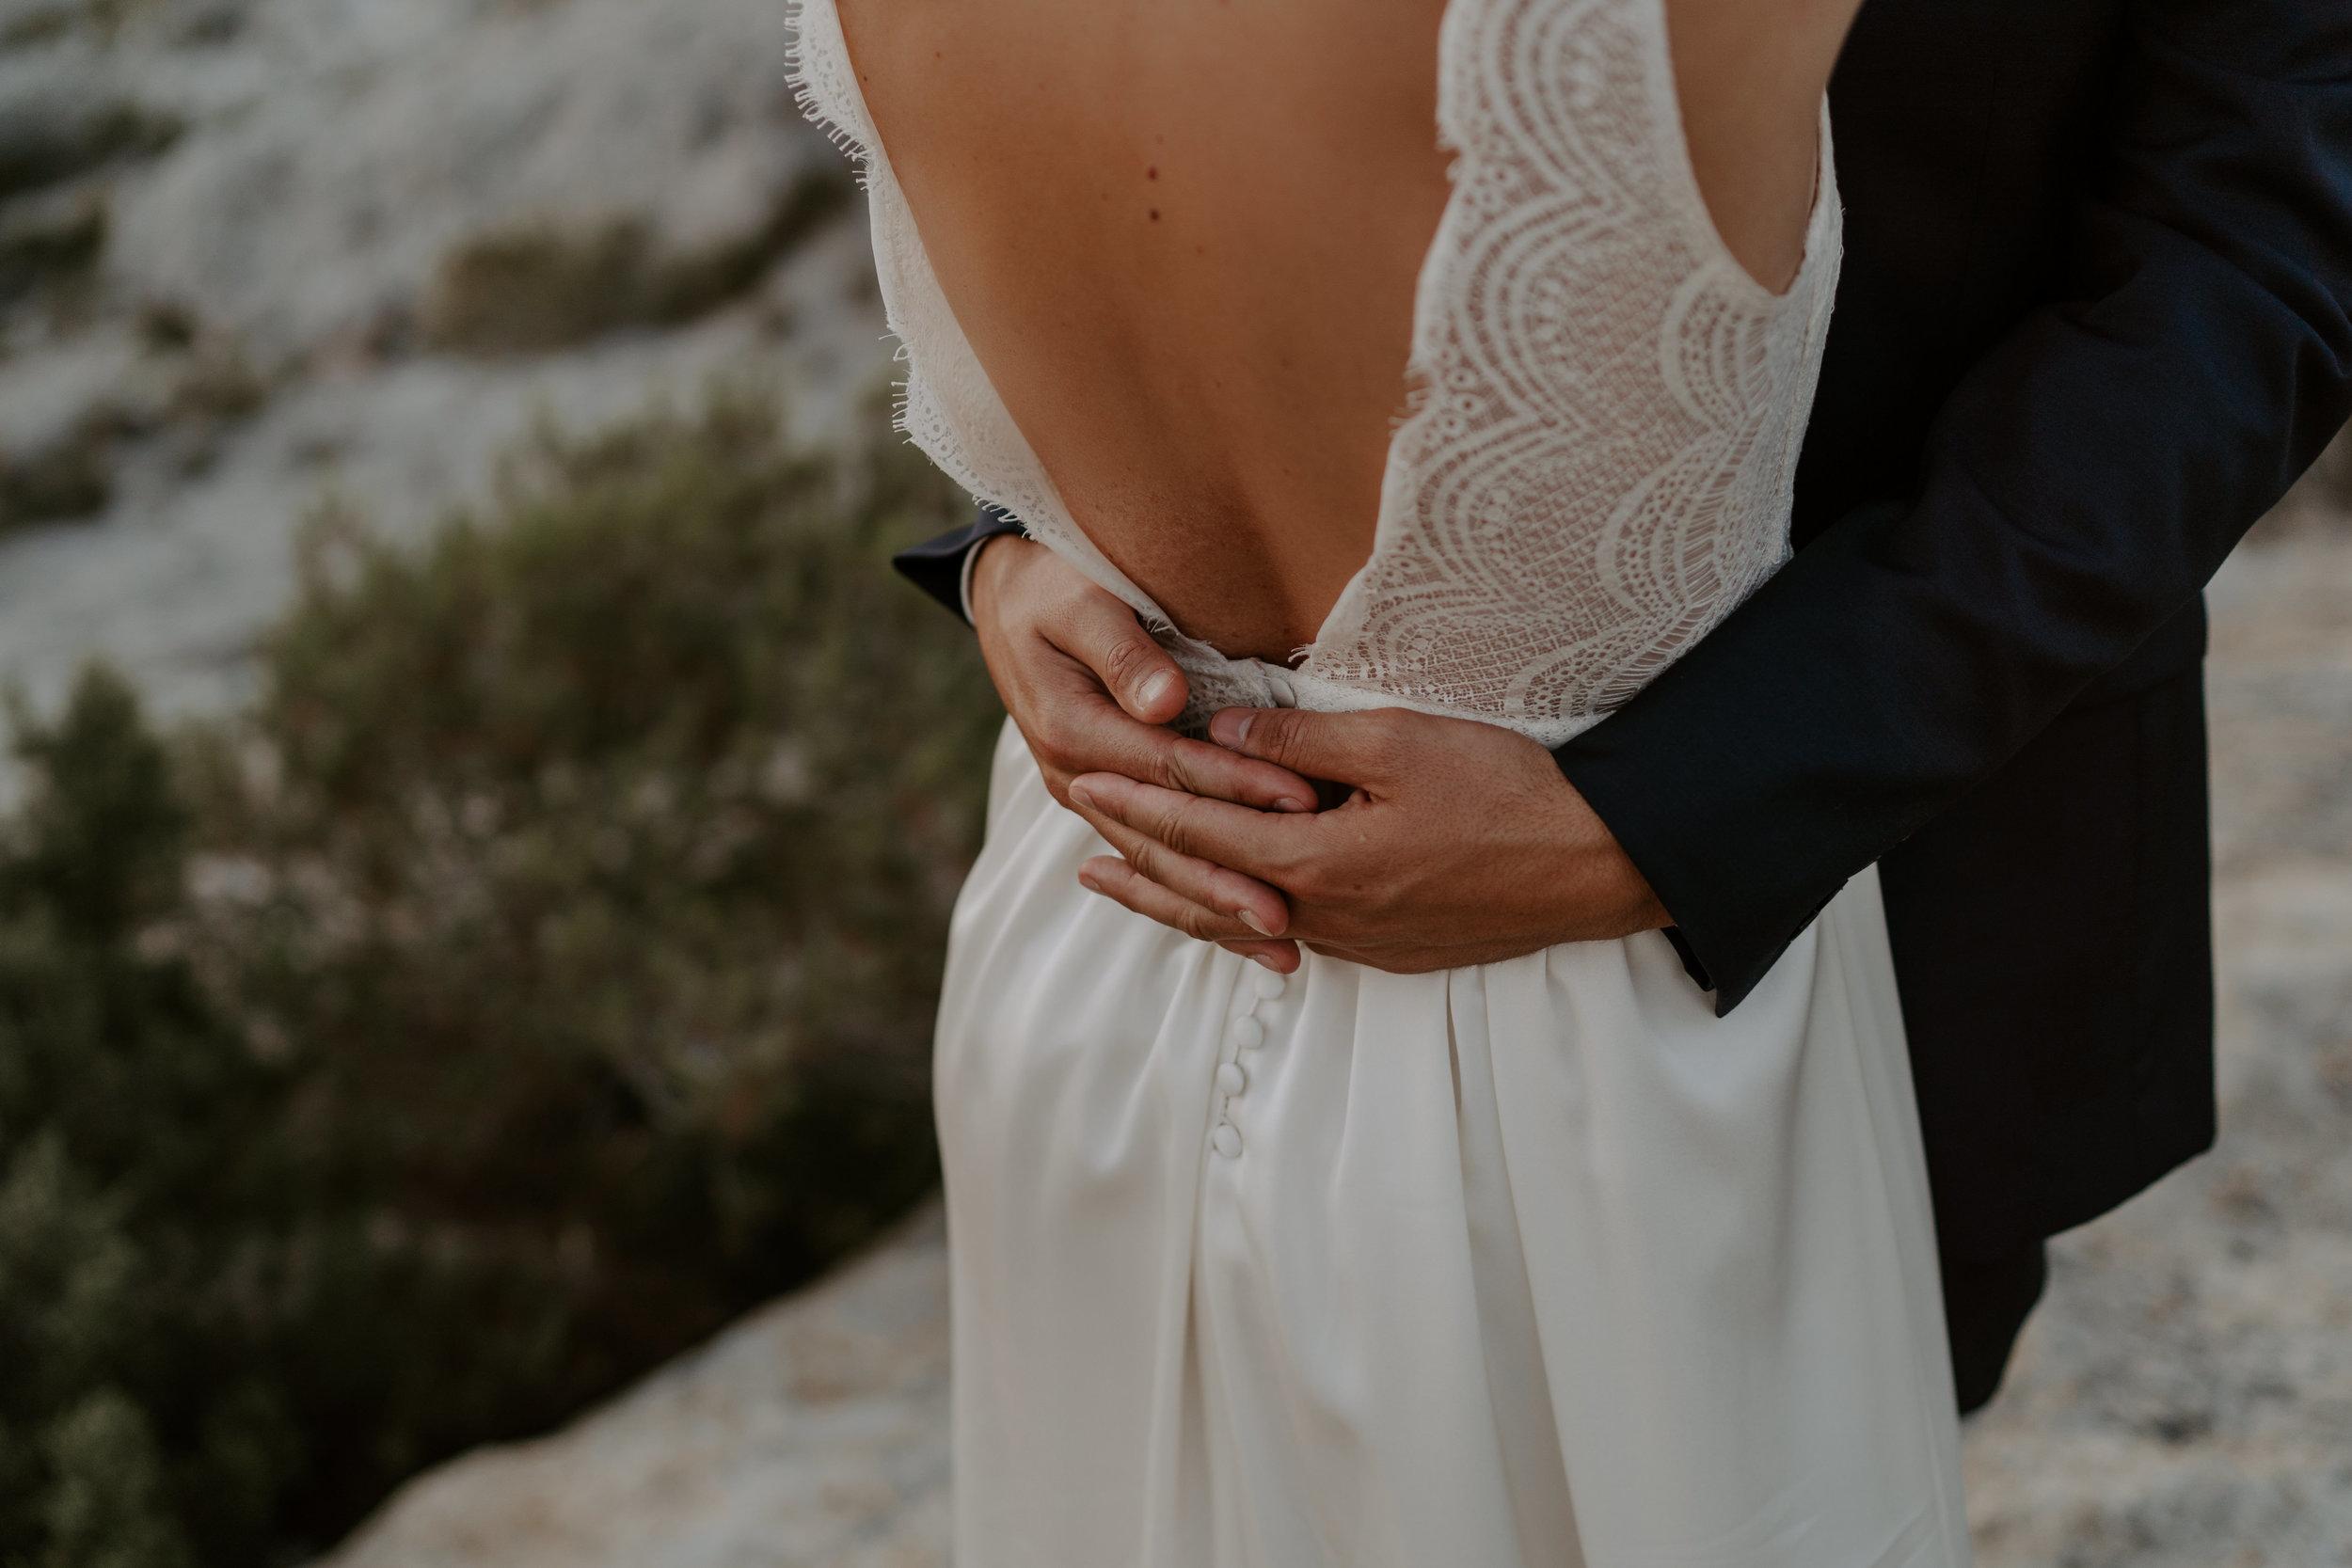 elsacaza_photographe_mariage_Juliette_Nicolas-711.jpg